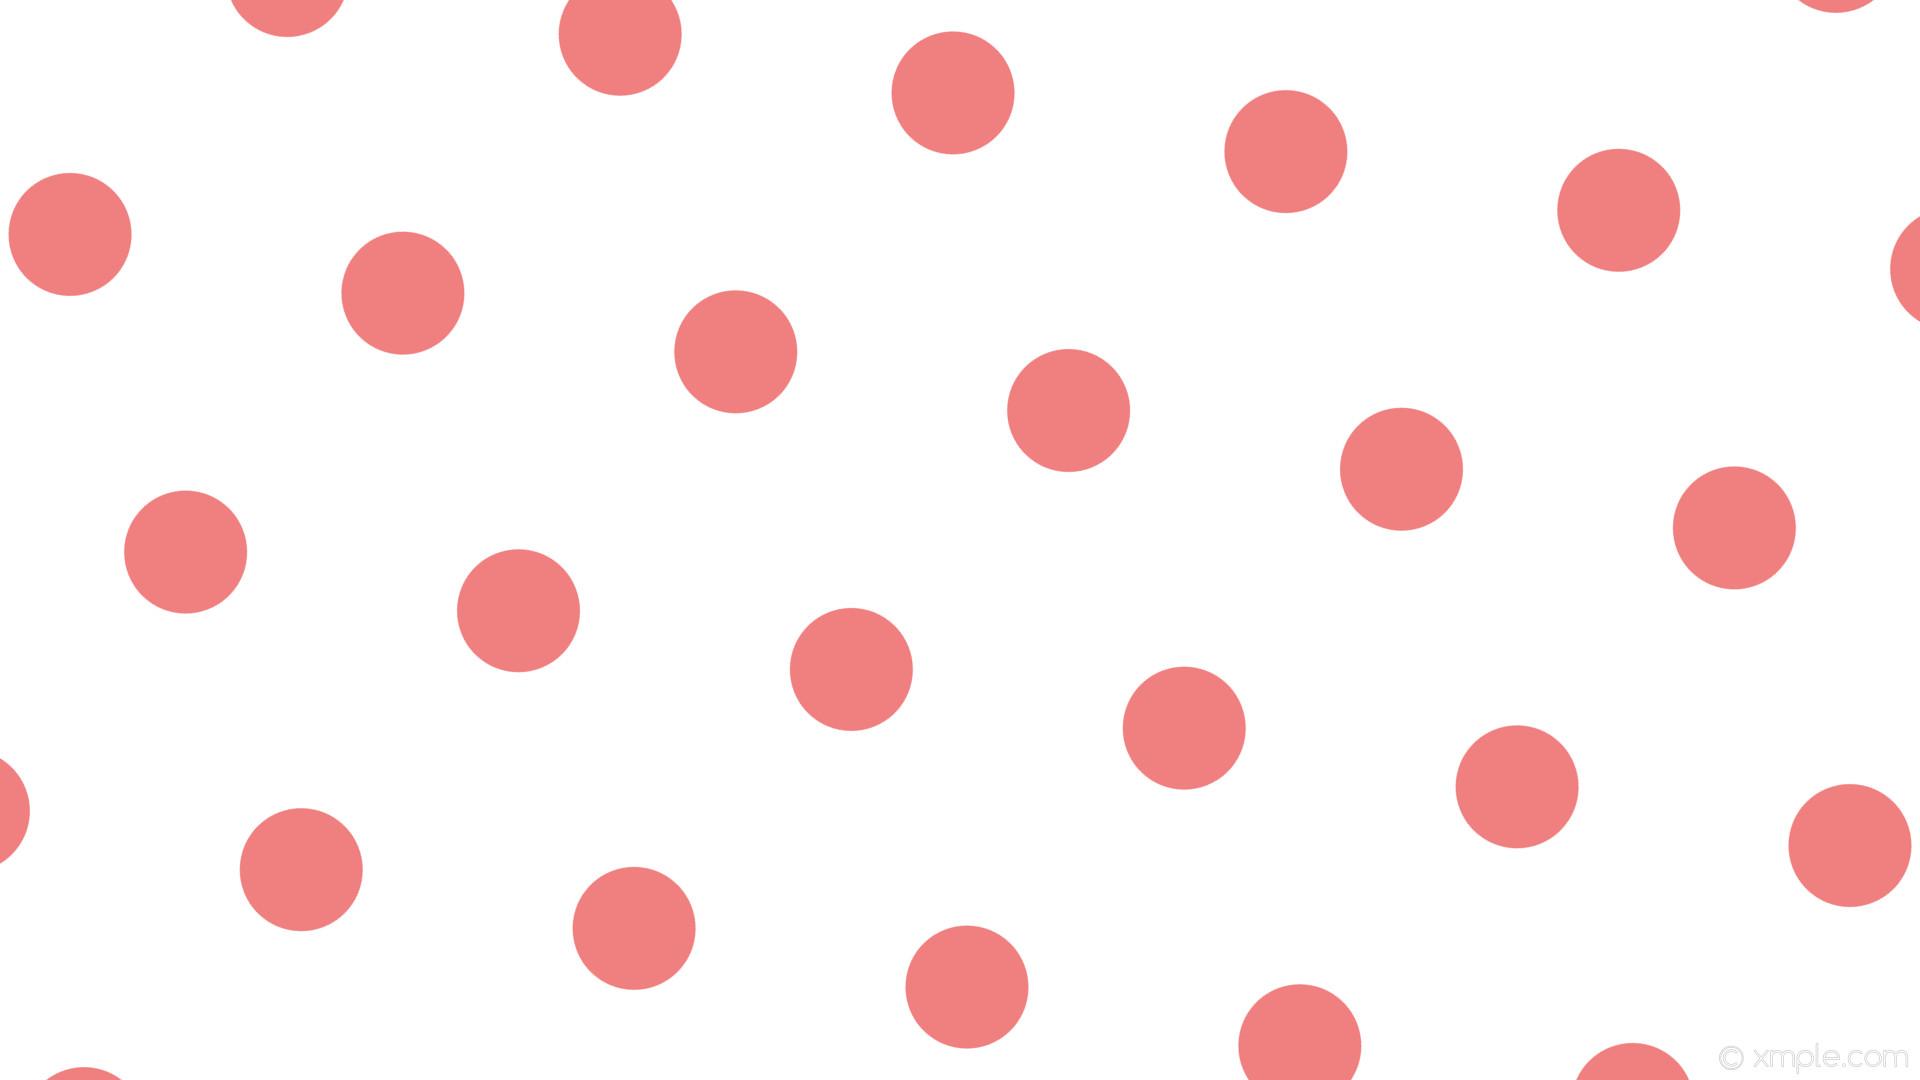 wallpaper red polka dots hexagon white light coral #ffffff #f08080 diagonal  50° 123px